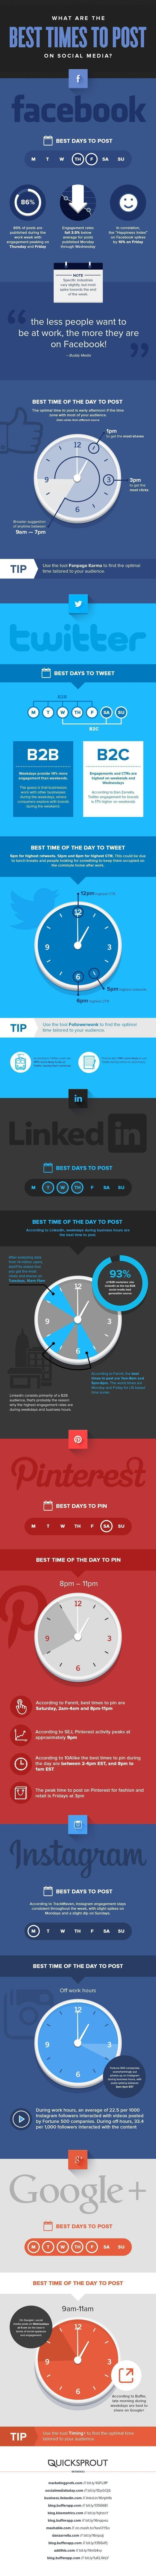 Horario para crear mejores posts en Facebook, Twitter, Pinterest, Google plus, Instagram y otras redes sociales. Best timing for scheduling content or posts in social media or social networks. Redes sociales, RRSS, seo, sem.